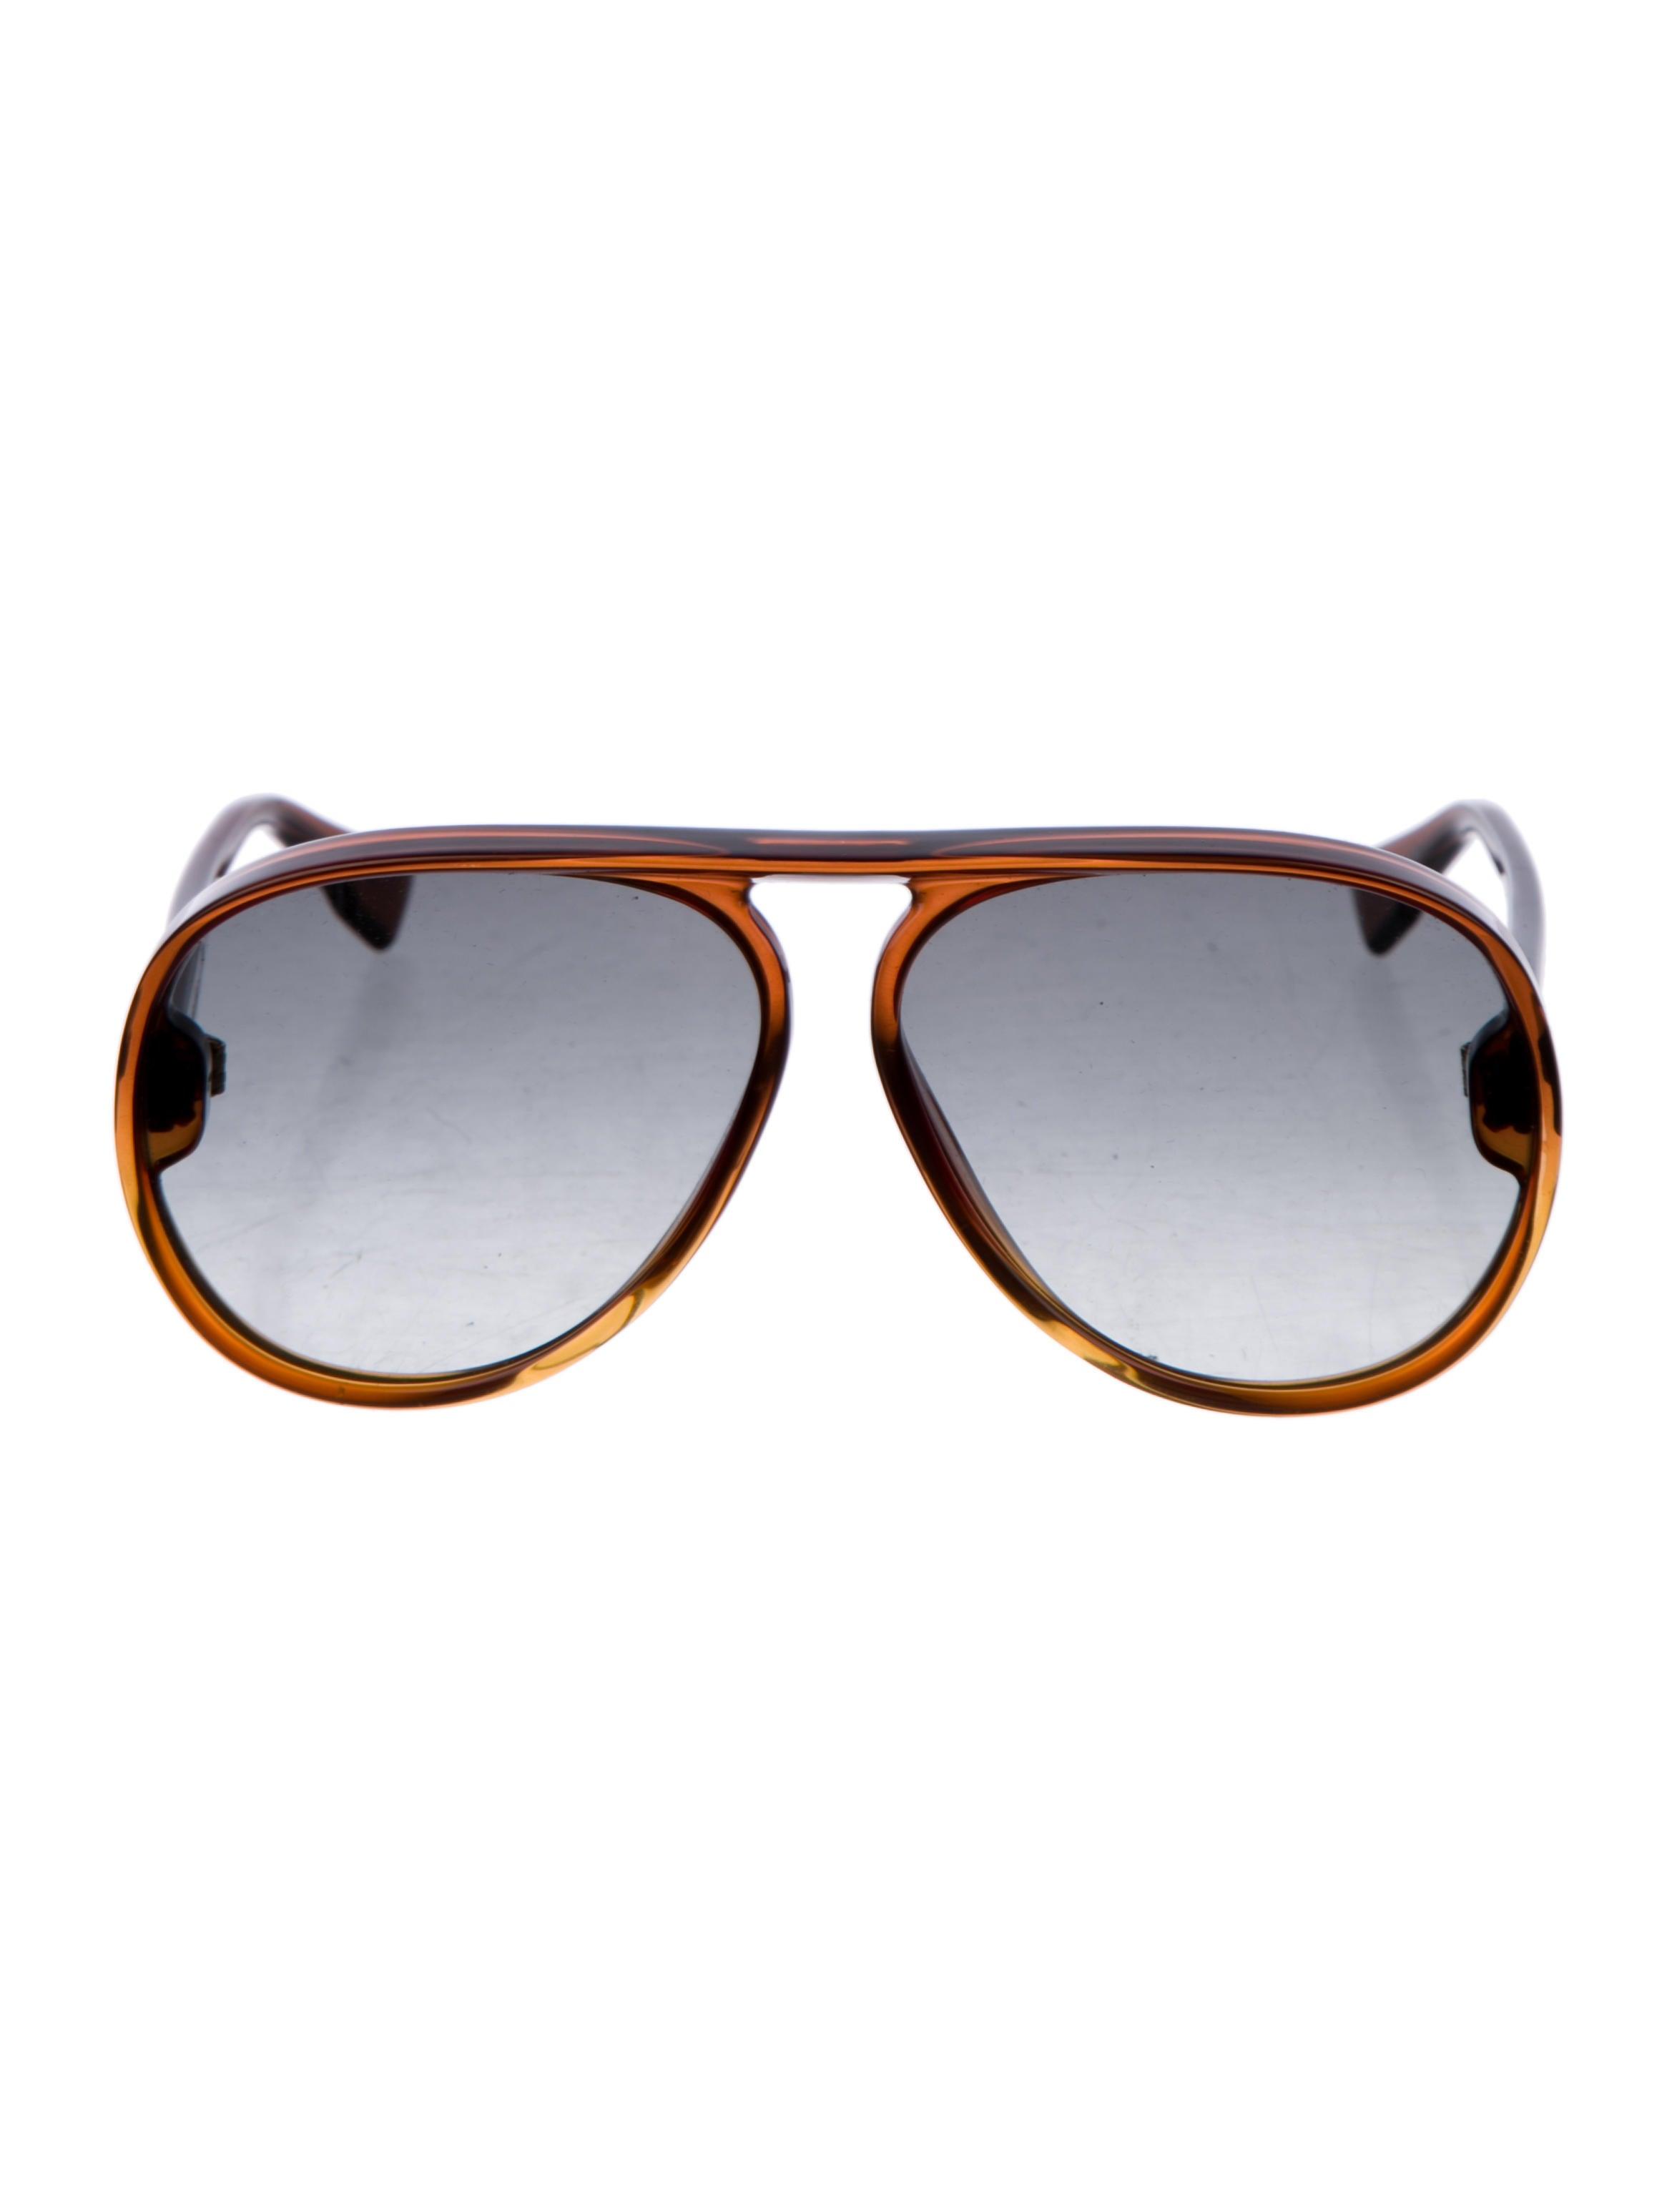 529402f575c Christian Dior DiorLia Aviator Sunglasses - Accessories - CHR80531 ...